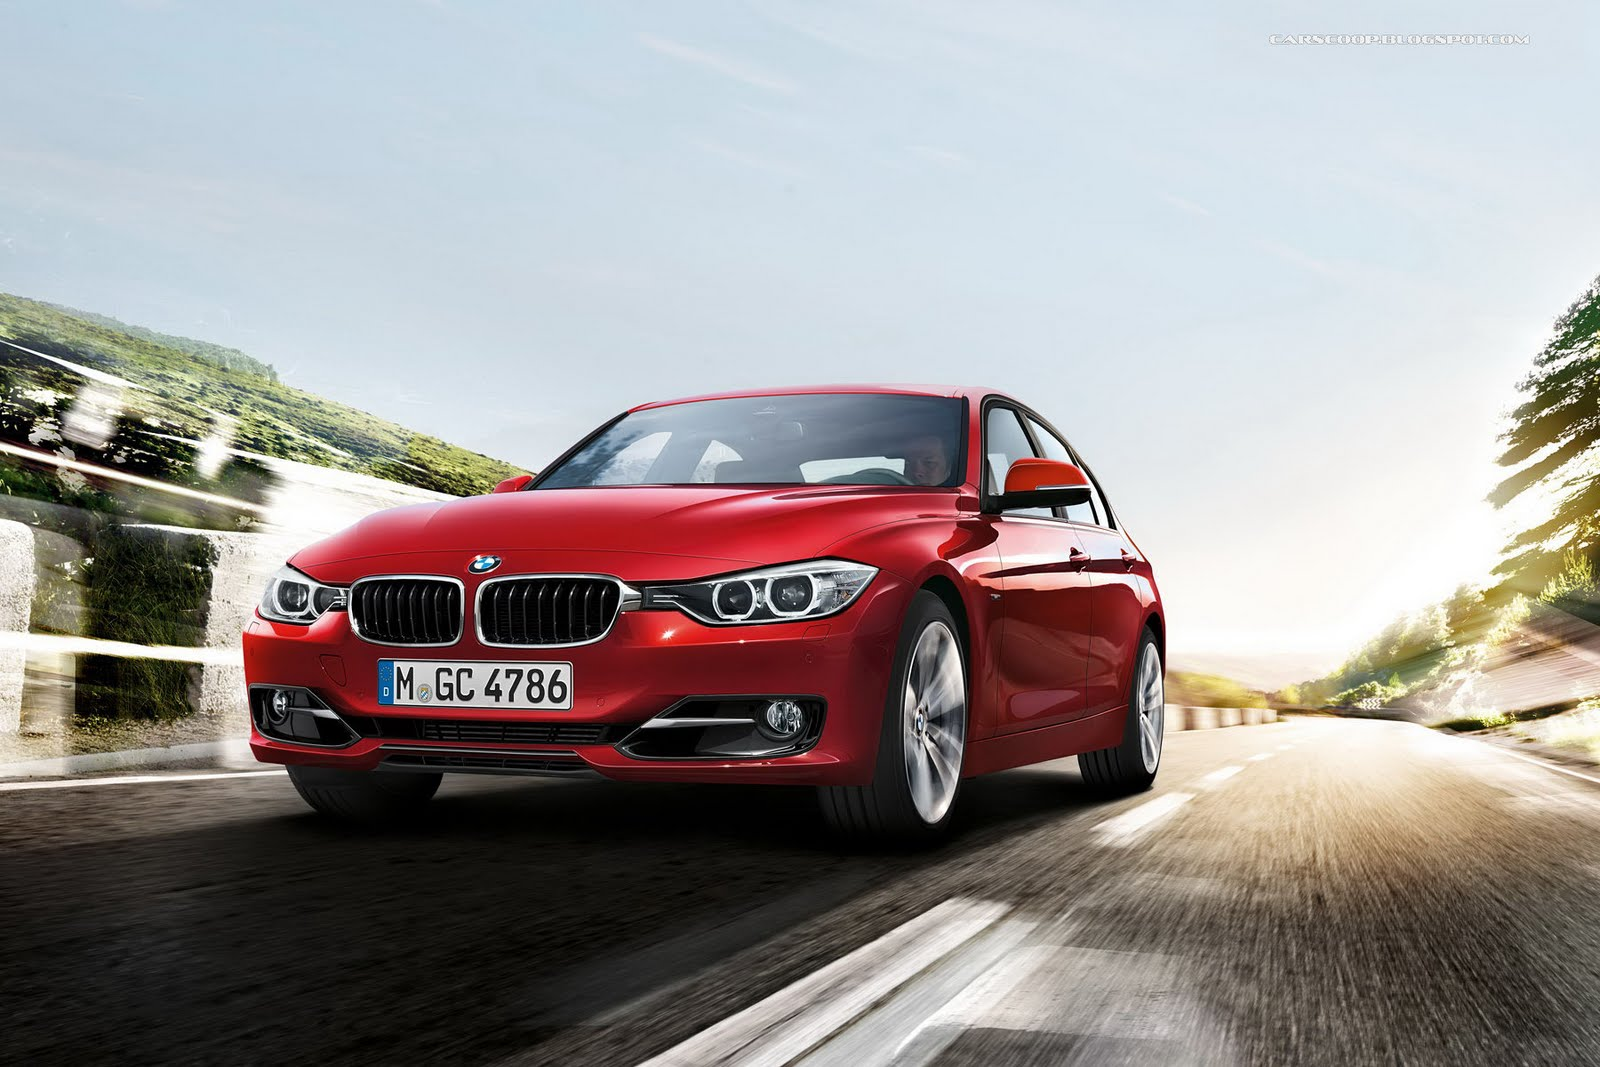 2012 BMW 3 Series (F30)